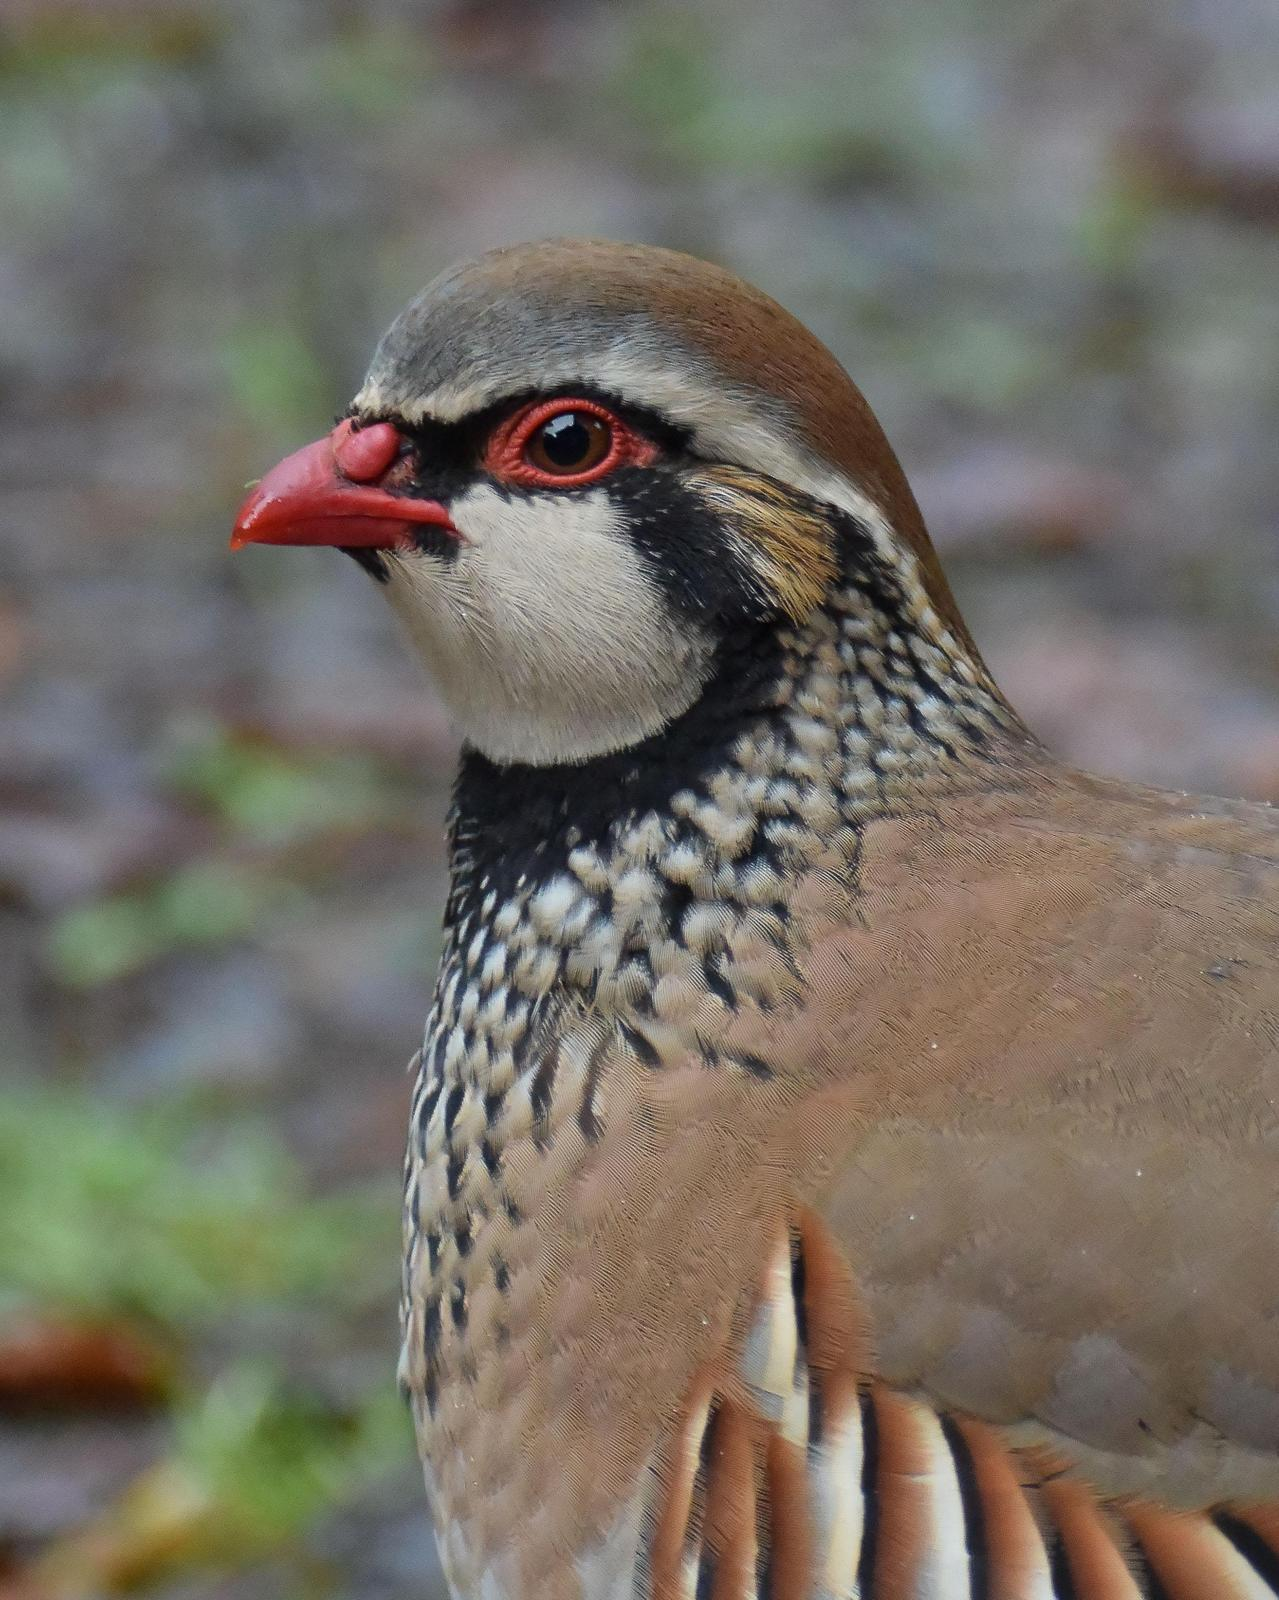 Red-legged Partridge Photo by Steve Percival